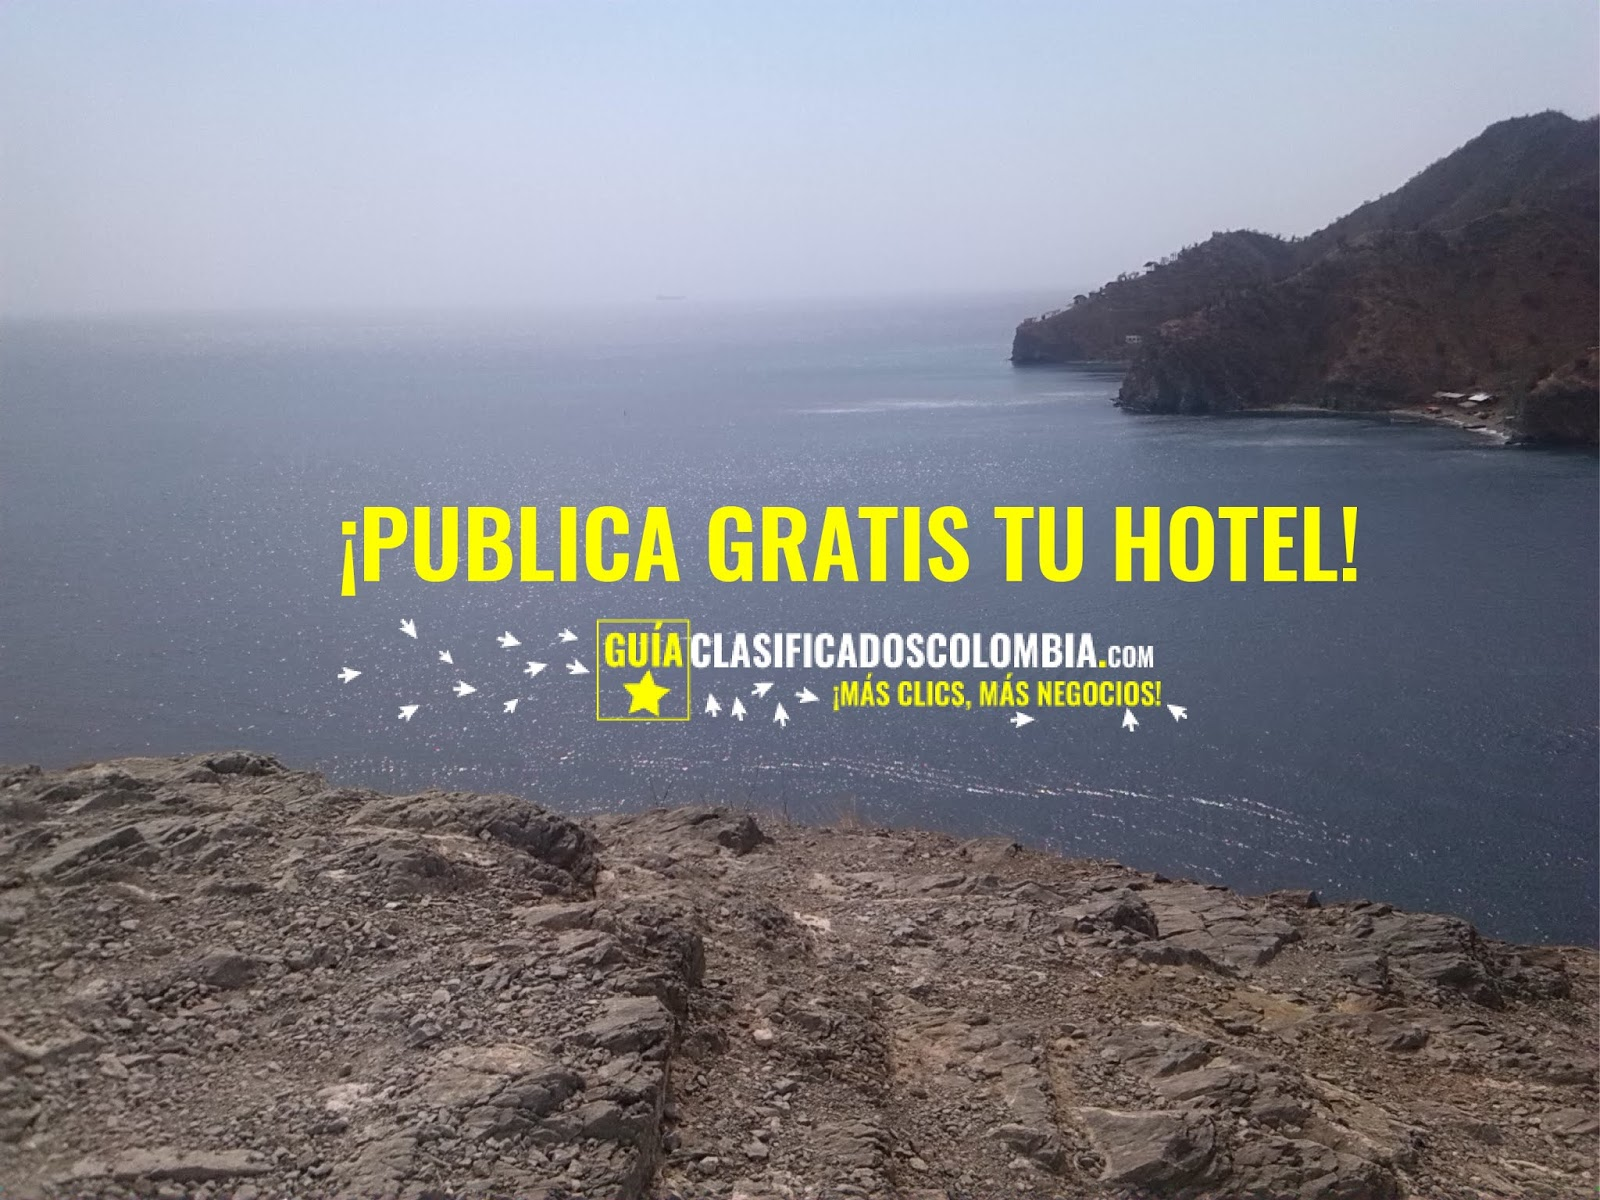 Publicar hotel gratis en Intenet